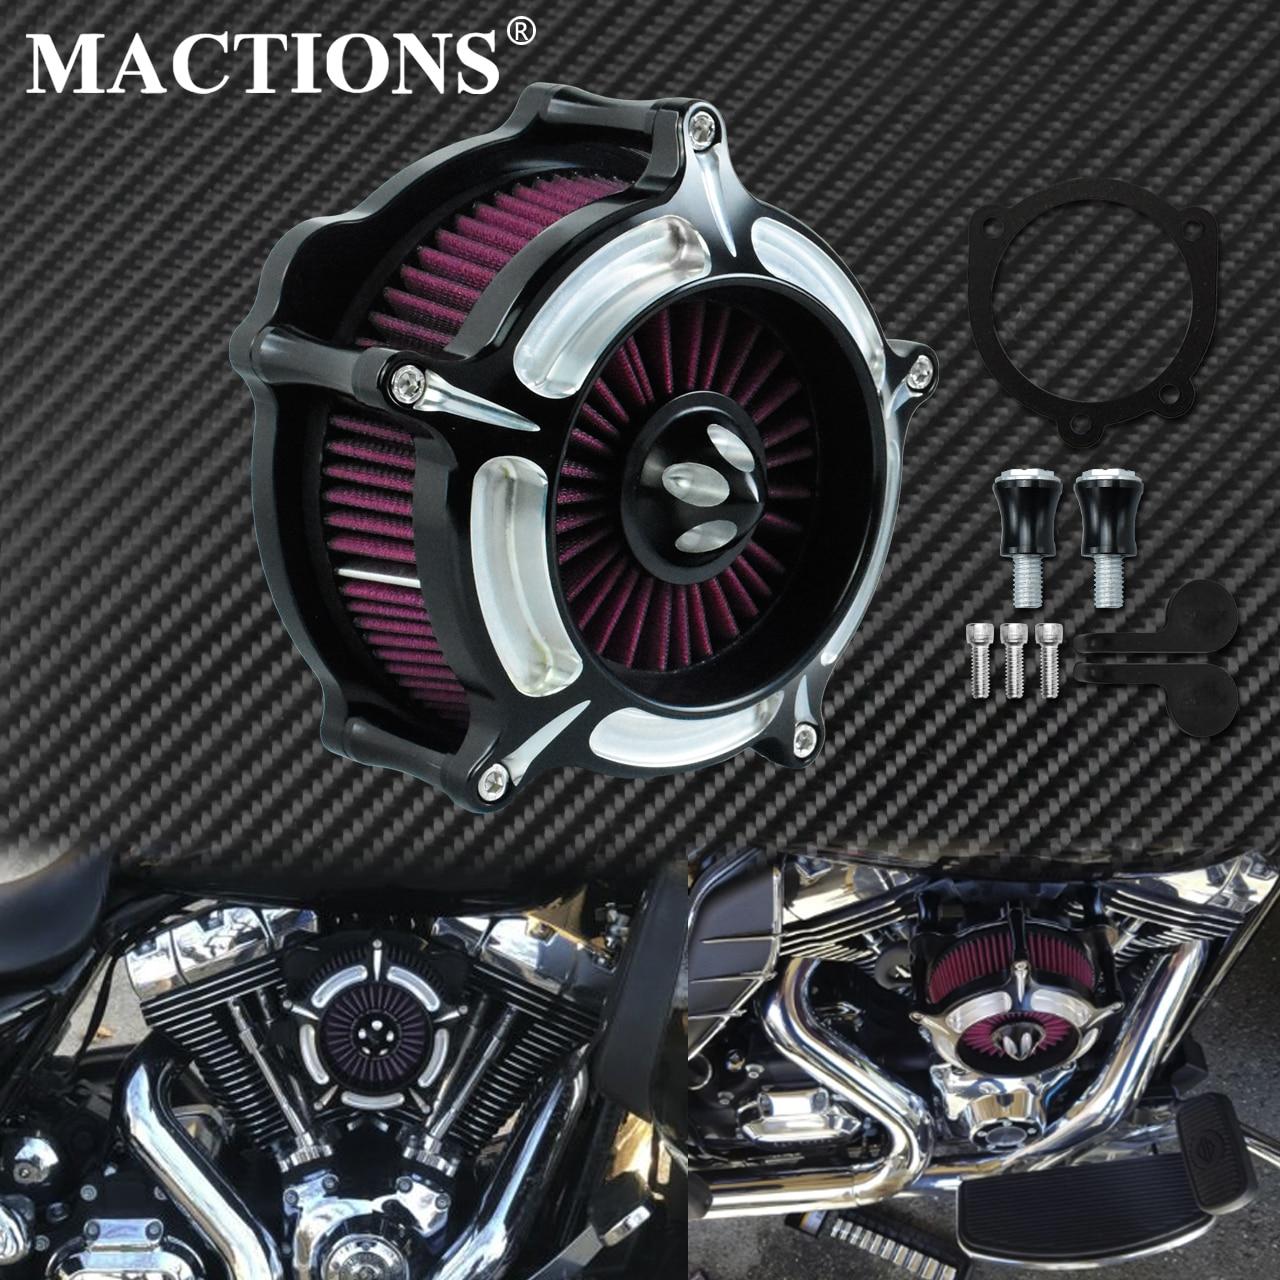 Motocicleta CNC rojo aire filtro del aire para Harley Sportster XL883 1200 Dyna calle Bob Super Glide Softail gira Road king